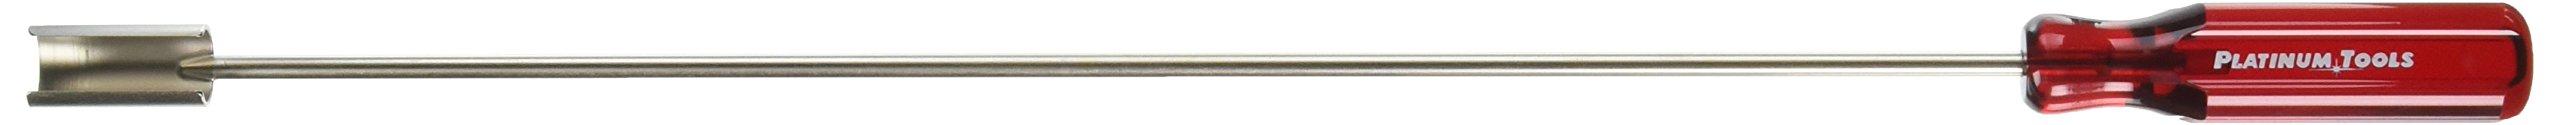 Platinum Tools Platinum 11001 BNC (18'') Removal Tool, Made in USA Pkg for Peghook.